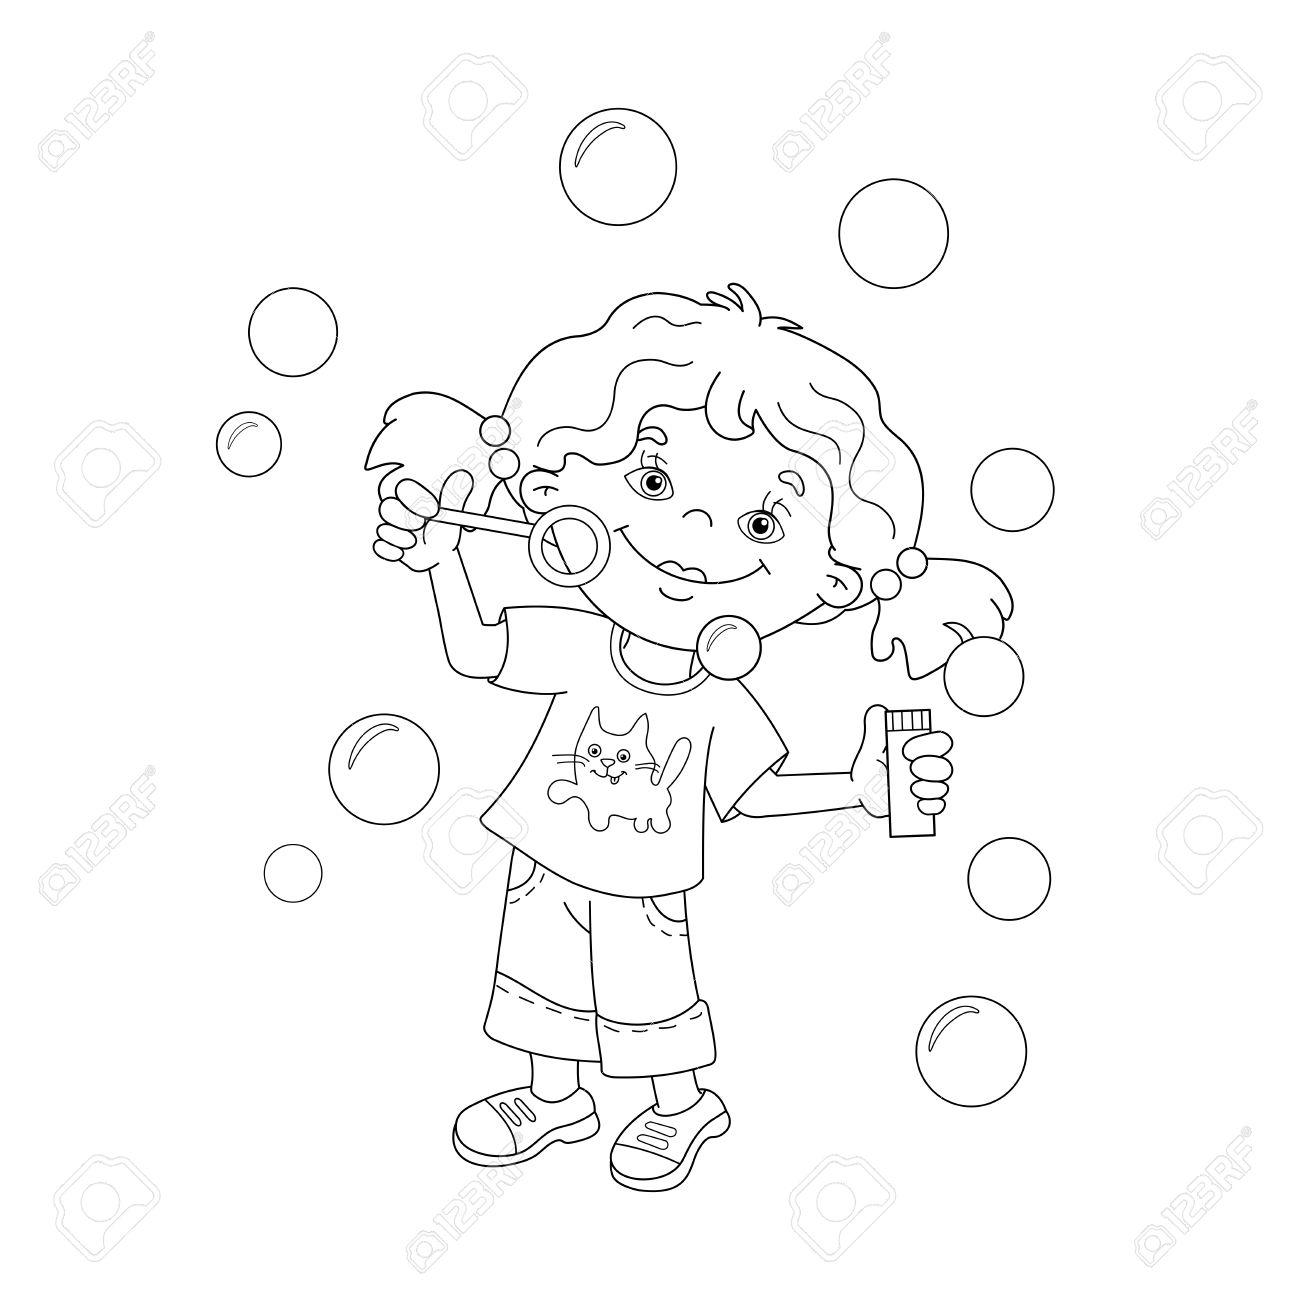 Página Para Colorear Esquema De Dibujos Animados Chica Soplando ...